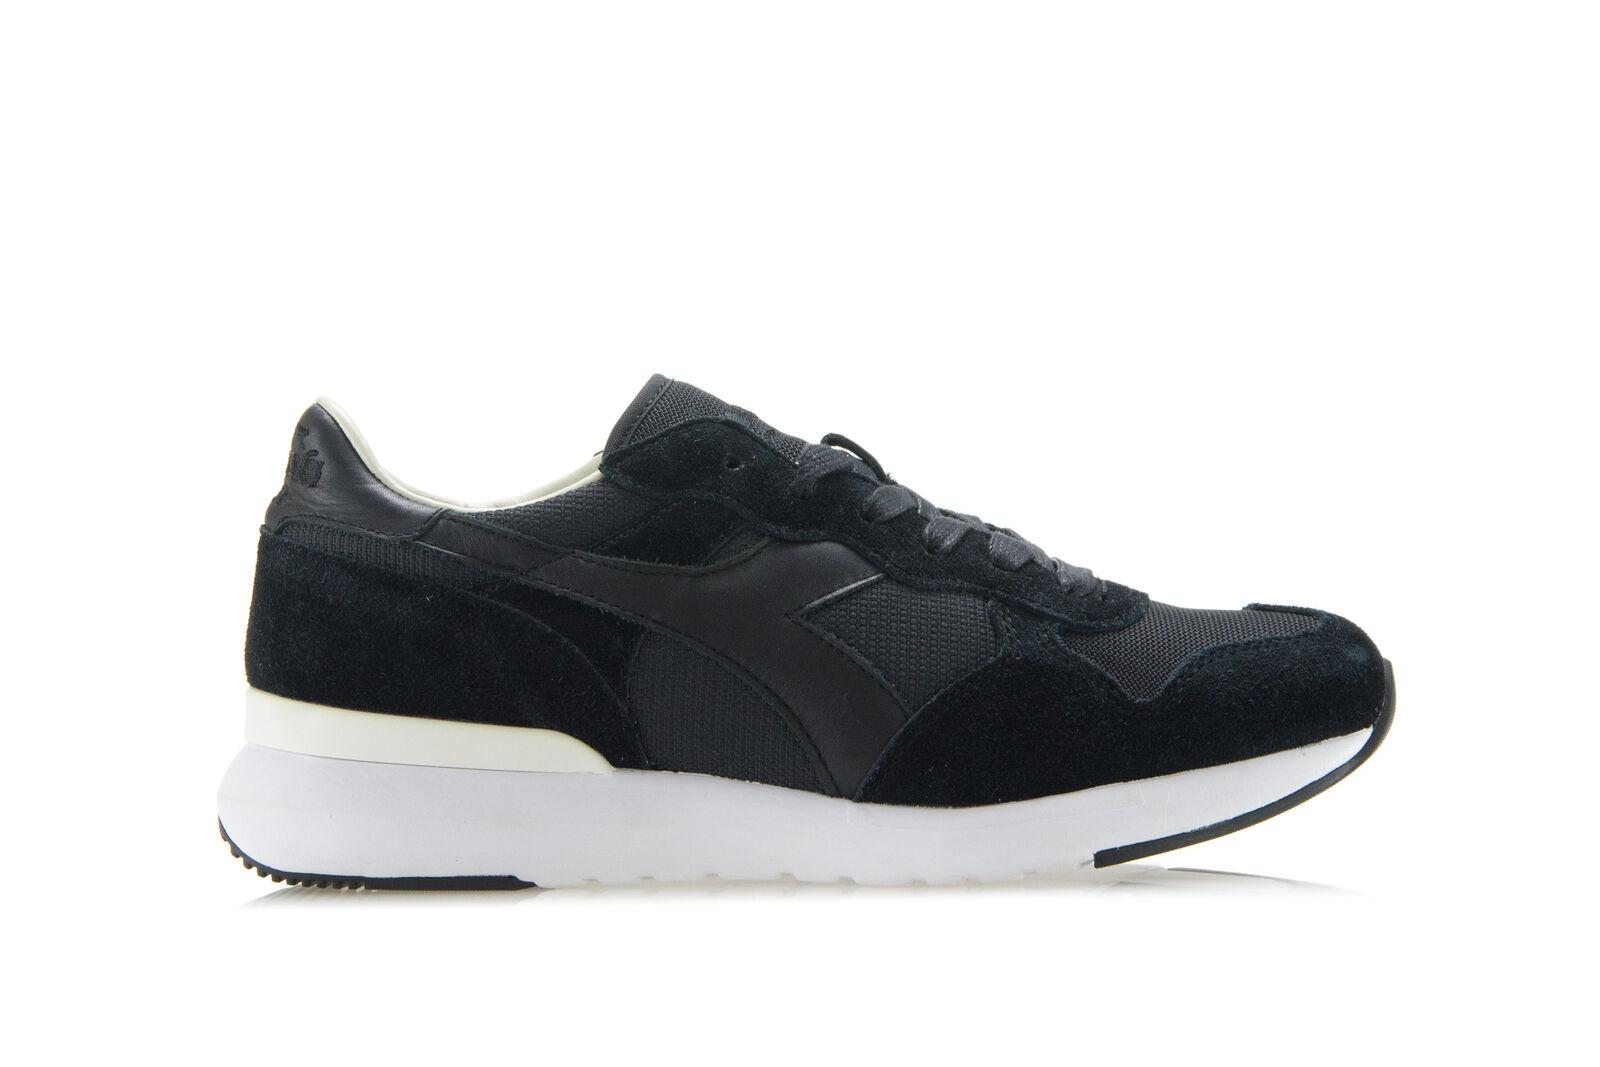 DIADORA HERITAGE HERITAGE HERITAGE Hombre Mujer Tenis Zapatos tridente Evo Negro Gamuza tenis  marca famosa